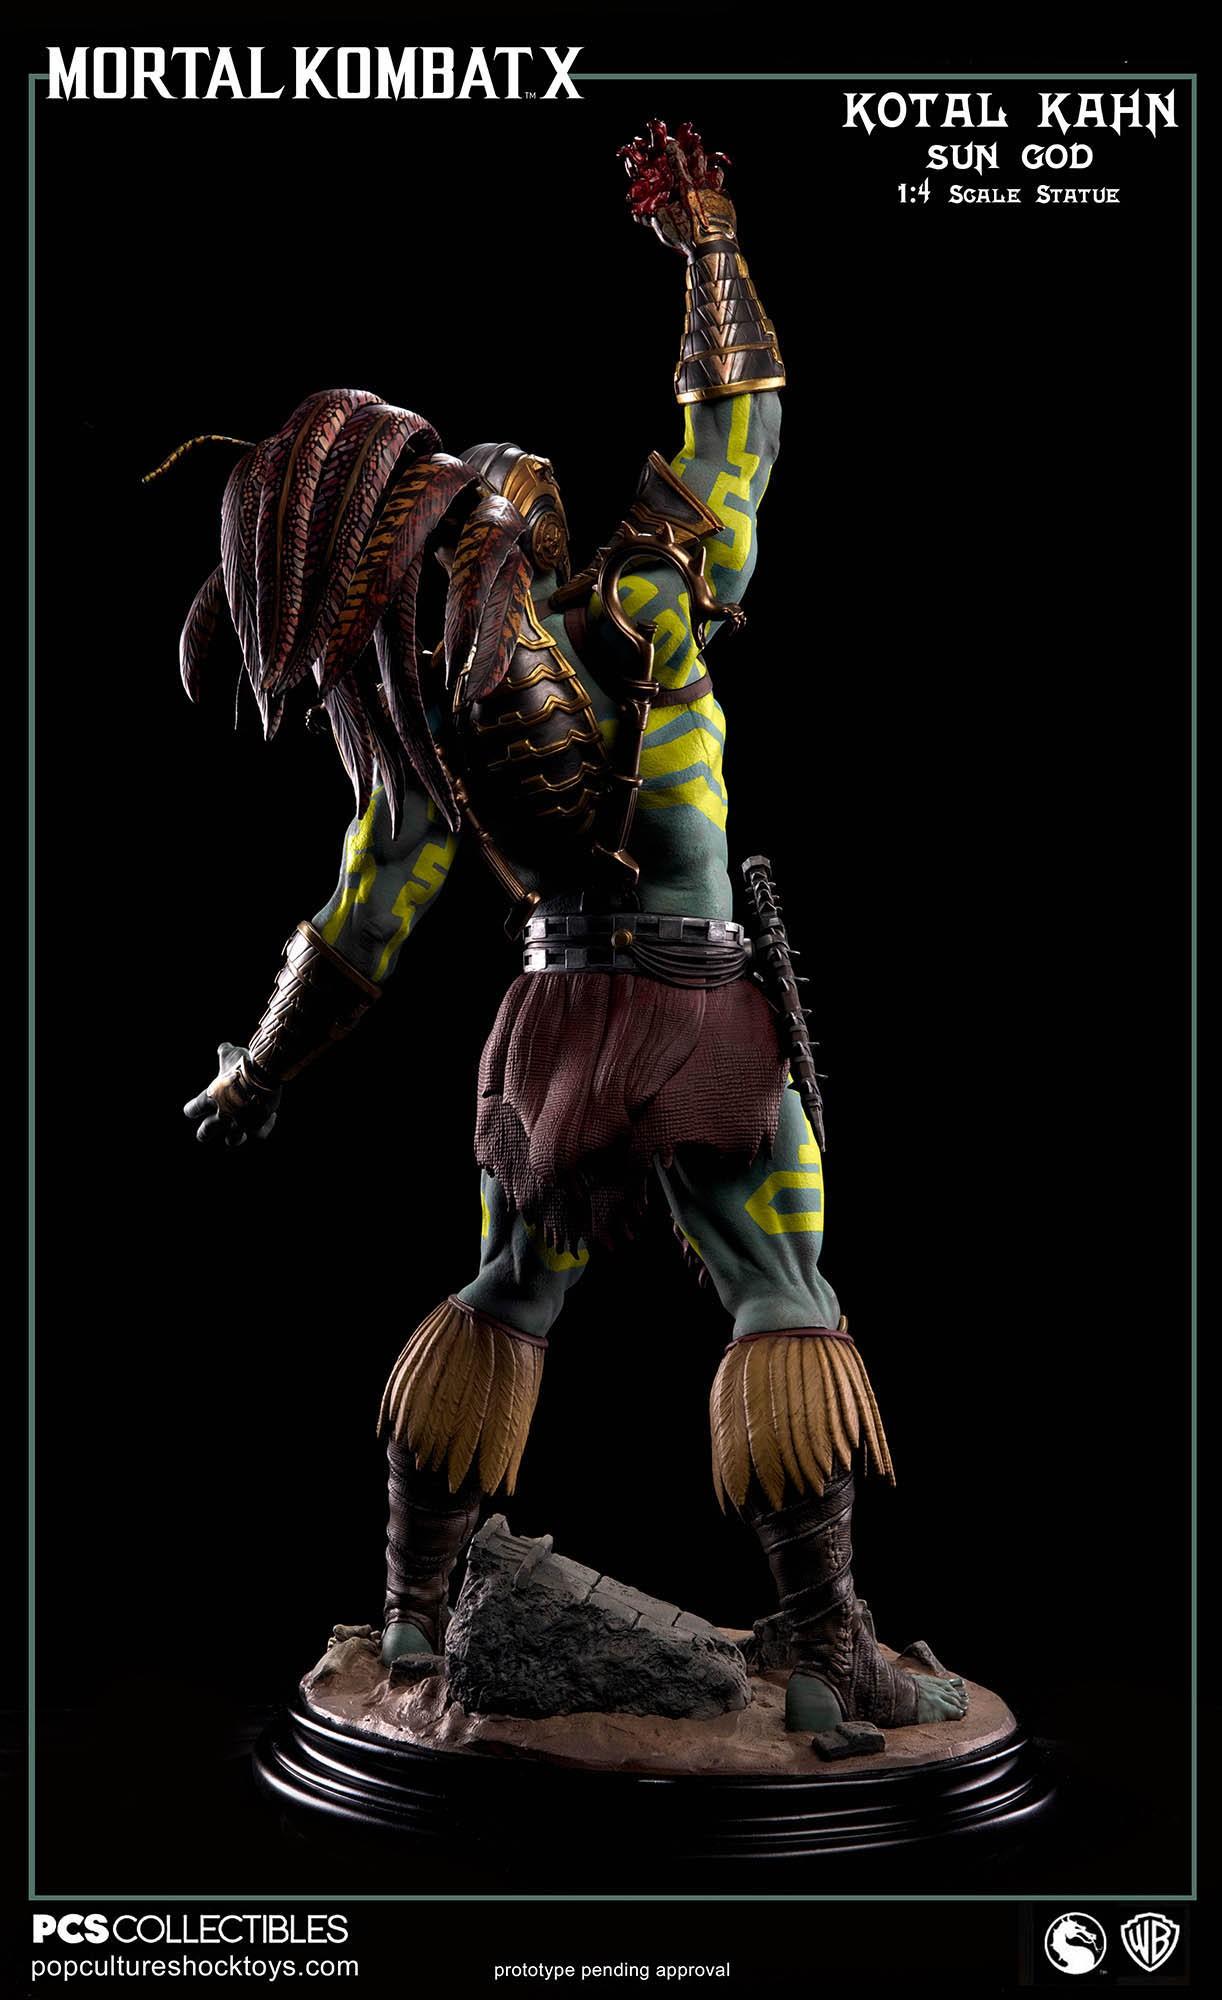 [Pop Culture Shock] Mortal Kombat X: Kotal Kahn 1:4 scale PCS-Kotal-Kahn-Sun-God-012